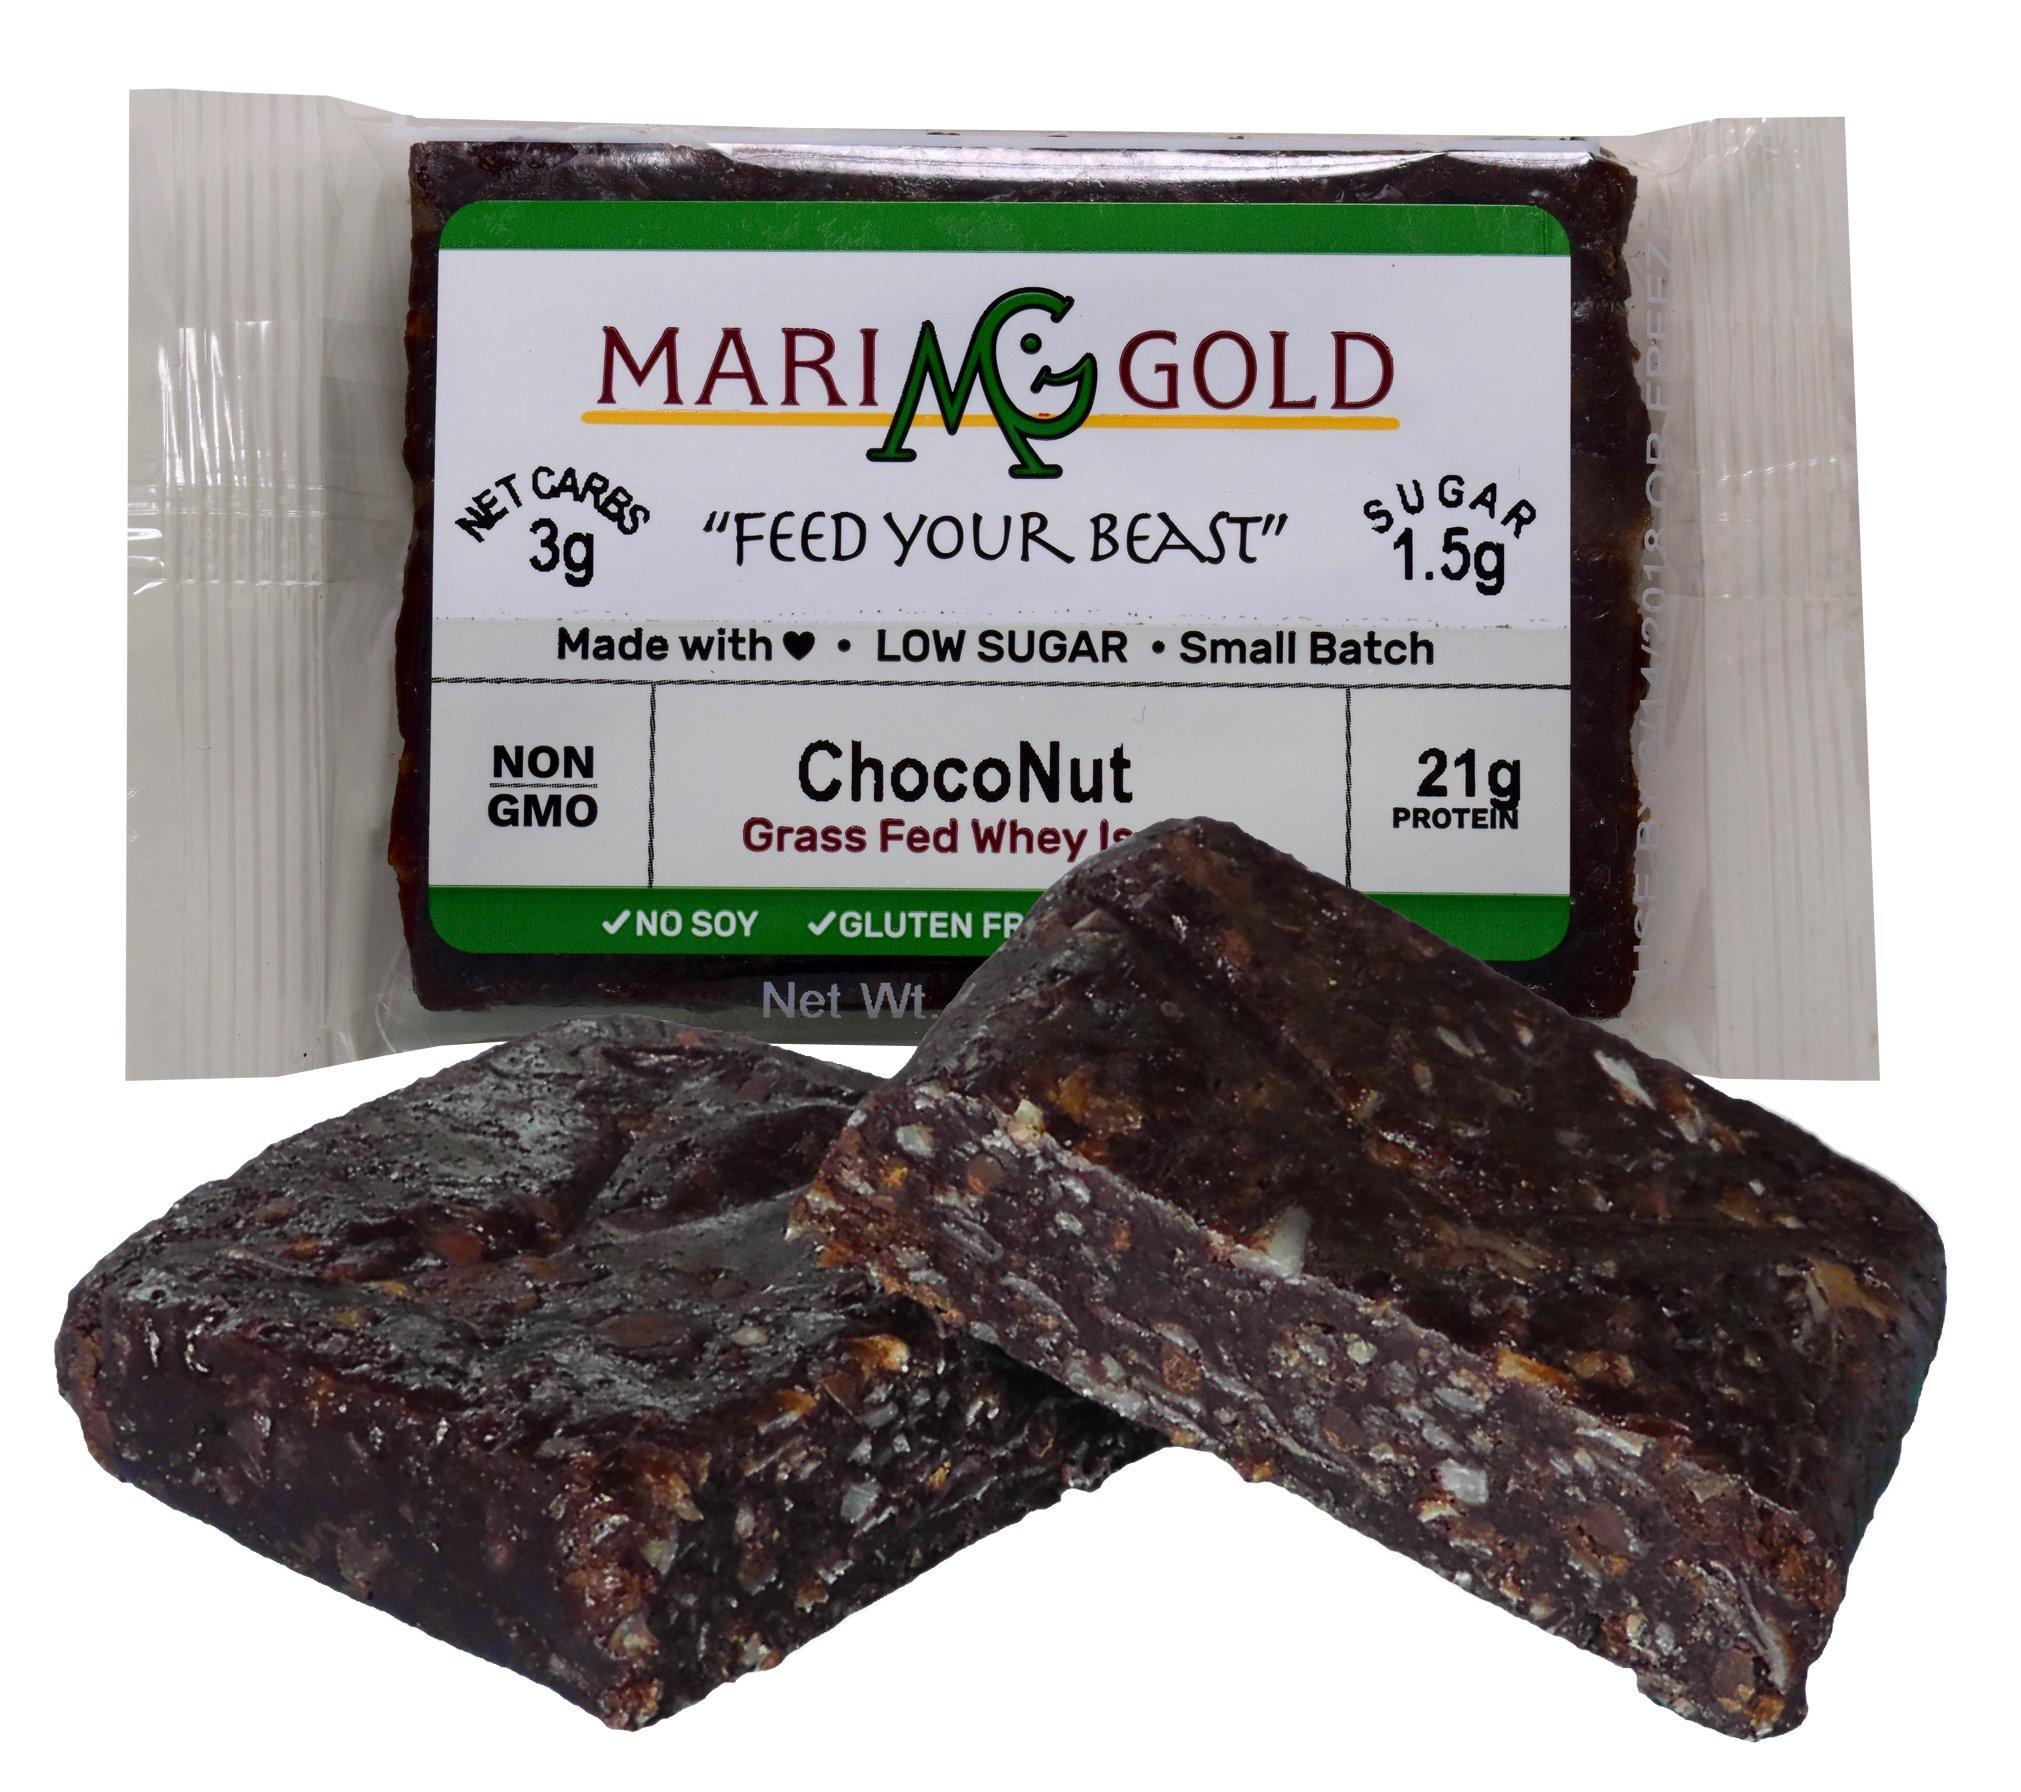 Keto (2-3 NET CARB) Protein Bar by MariGold - Amazing Taste Ketogenic Snacks - Organic Fats, 1 g Sugar, 21 g Protein GRASS FED Whey - Non GMO. Made Fresh, Ships Fresh. (12 bars) by MariGold Bars (Image #7)